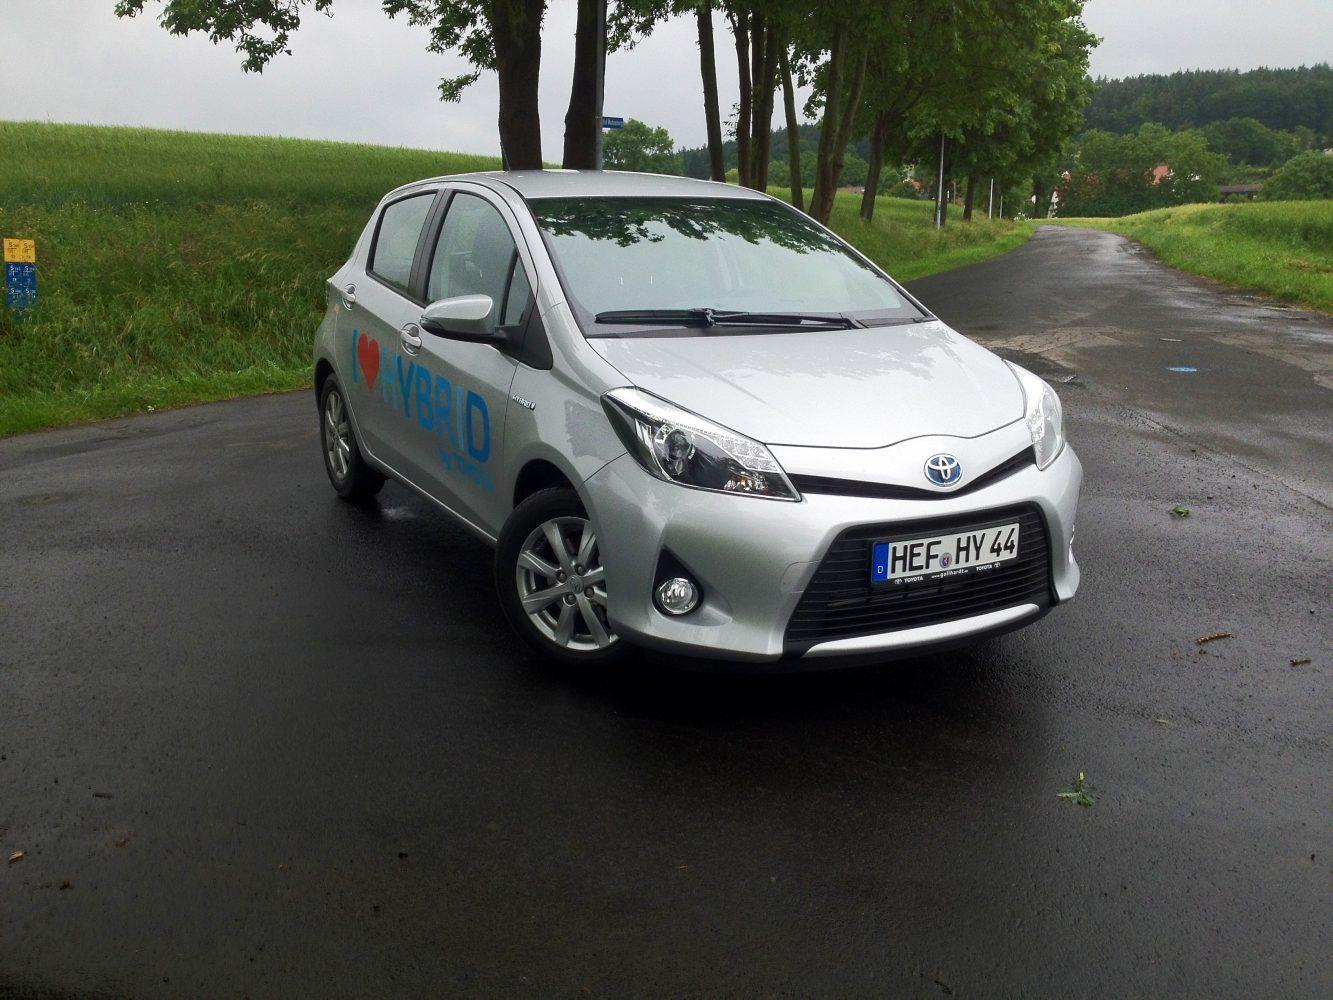 Probefahrt mit dem Toyota Yaris Hybrid